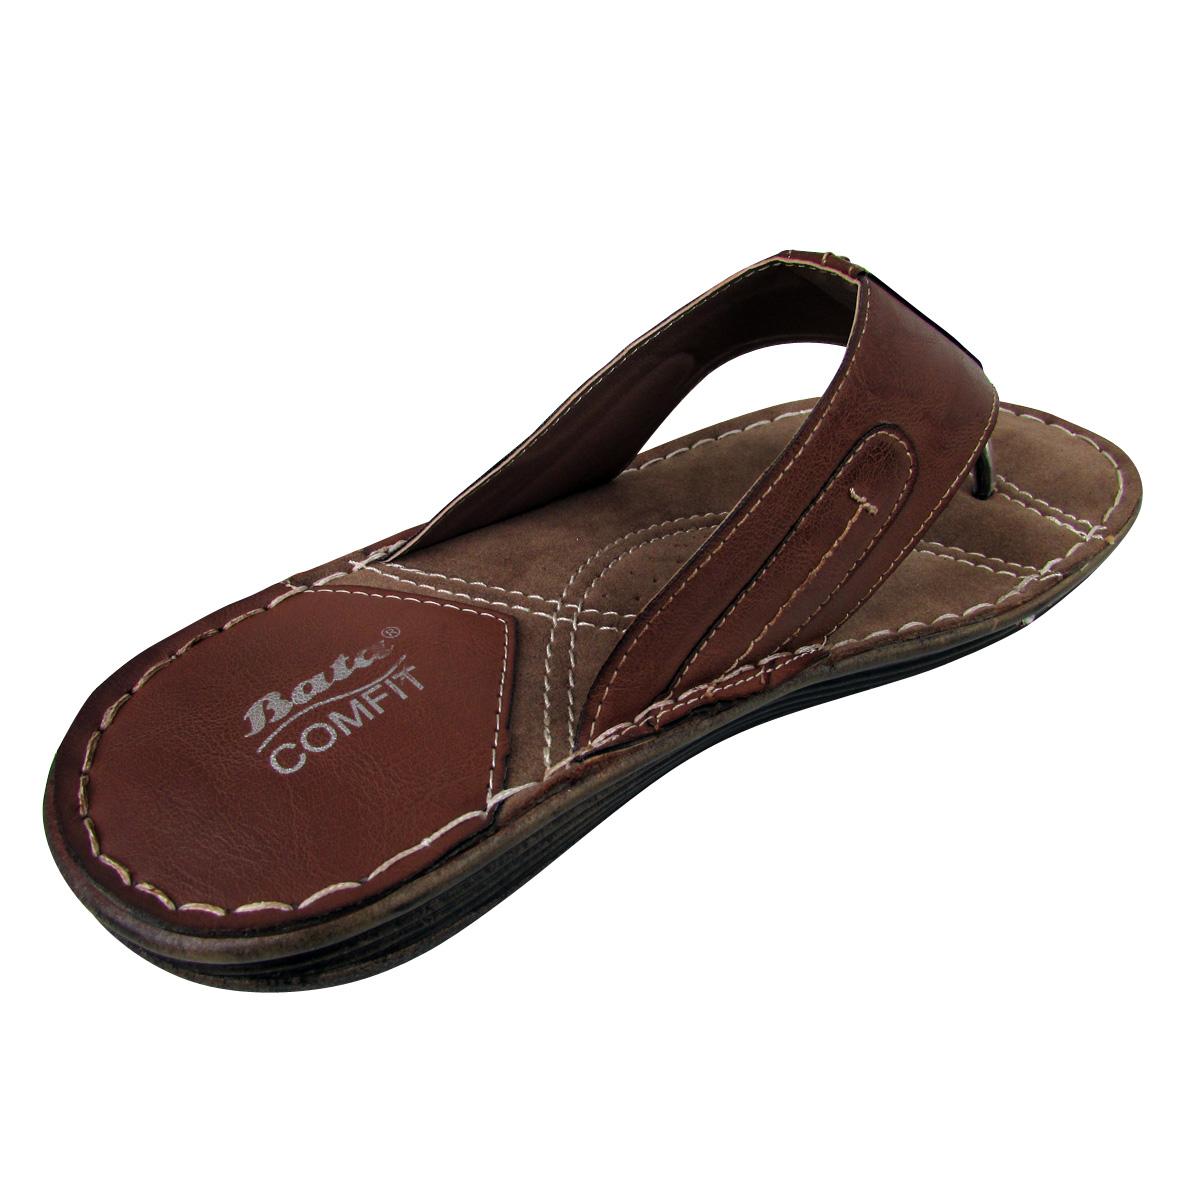 Mens Leather Smart Bata Sandals Mule Casual Quality Sandal Shoes Cut Out Design Ebay